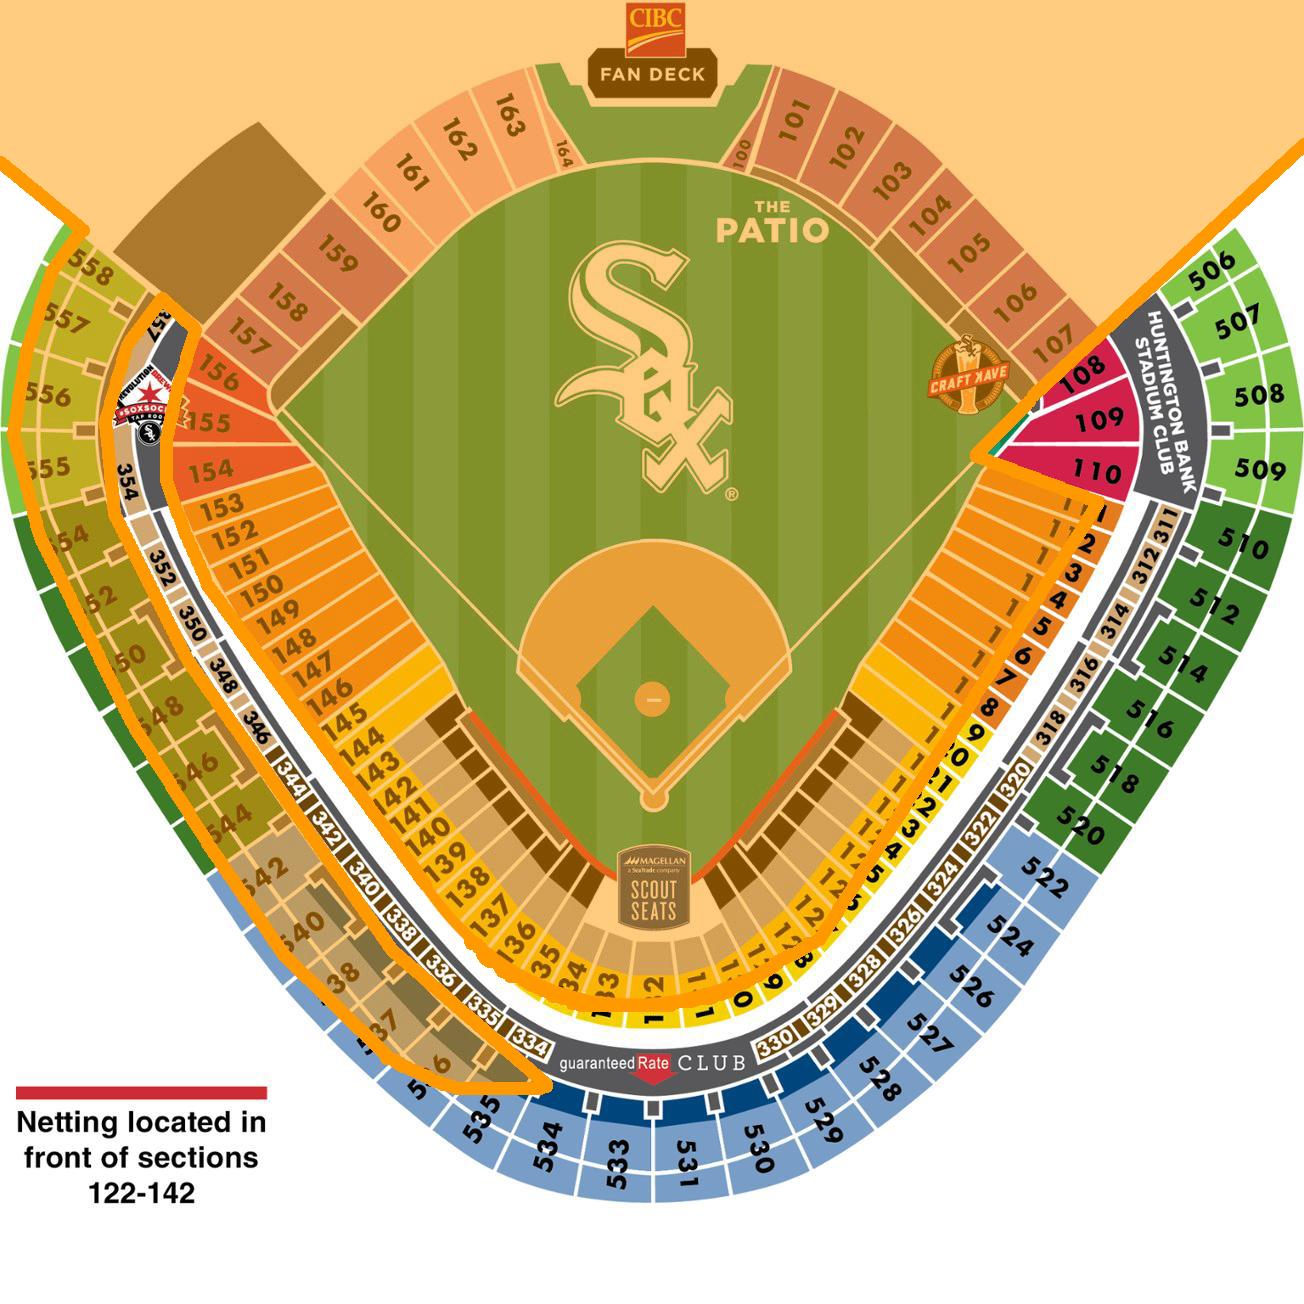 *Orange area indicates sun exposure    edited from source:https://www.mlb.com/whitesox/ballpark/seat-map